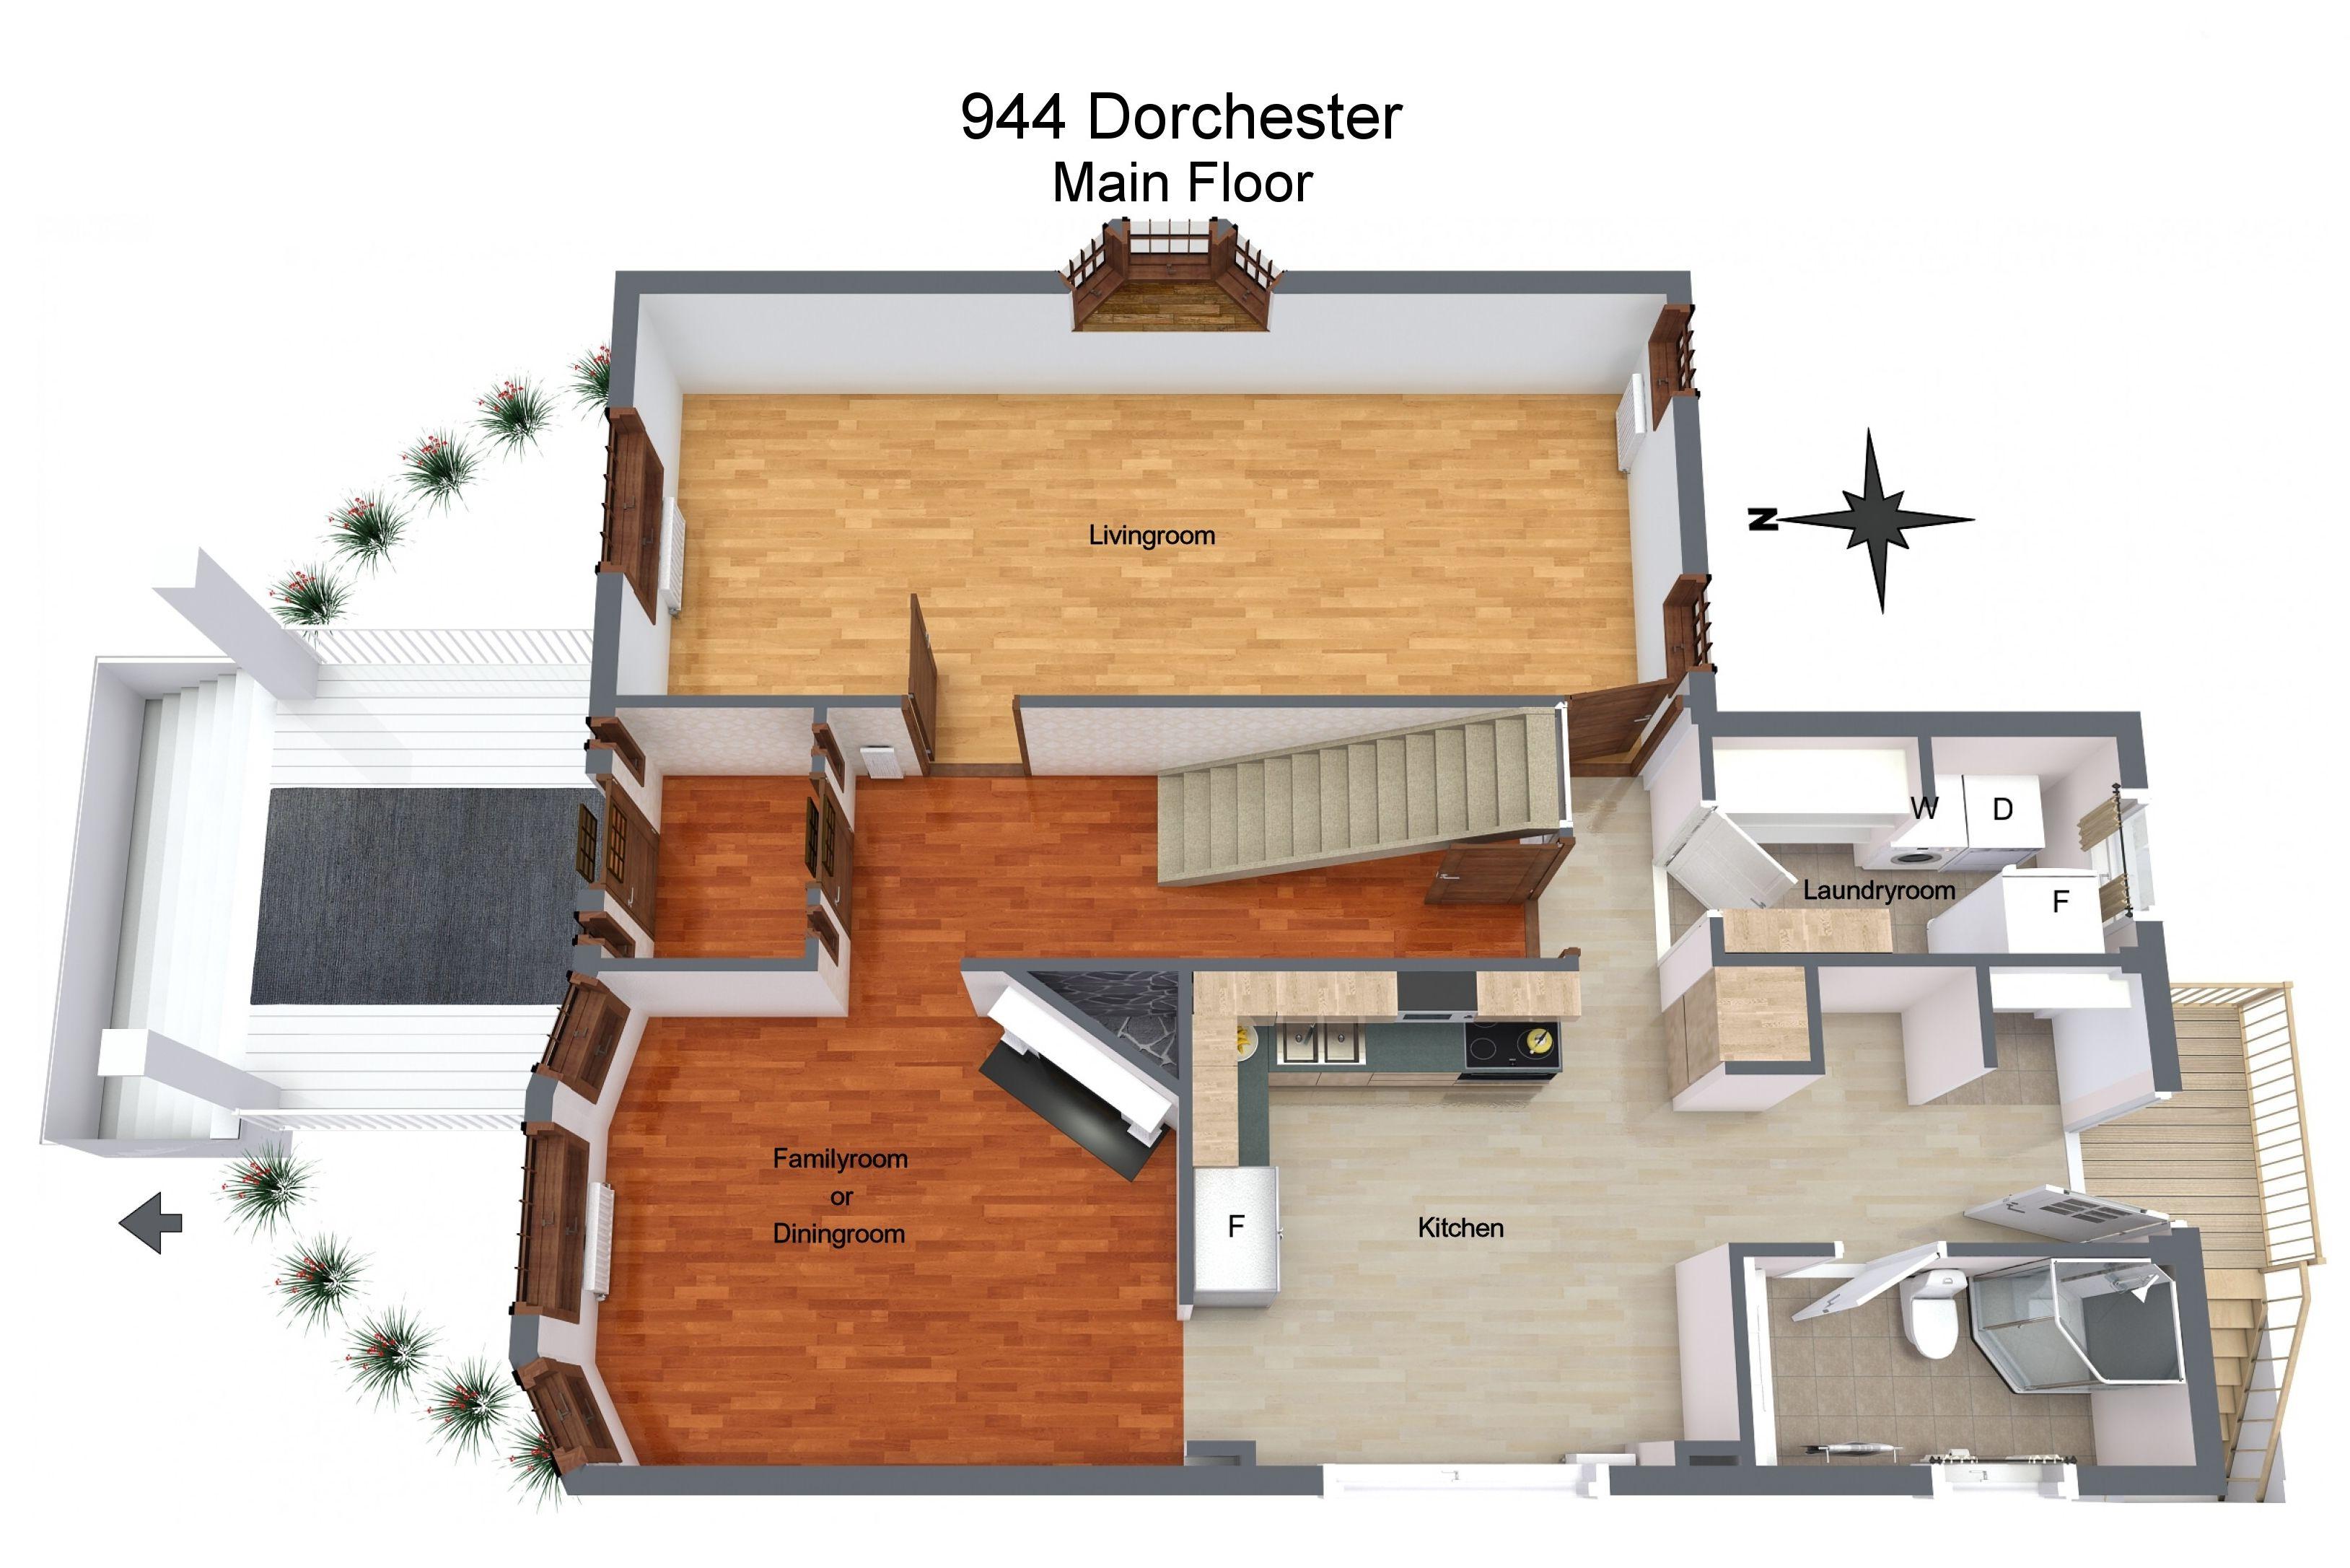 944 Dorchester Avenue, Winnipeg Level 1 Floor plans